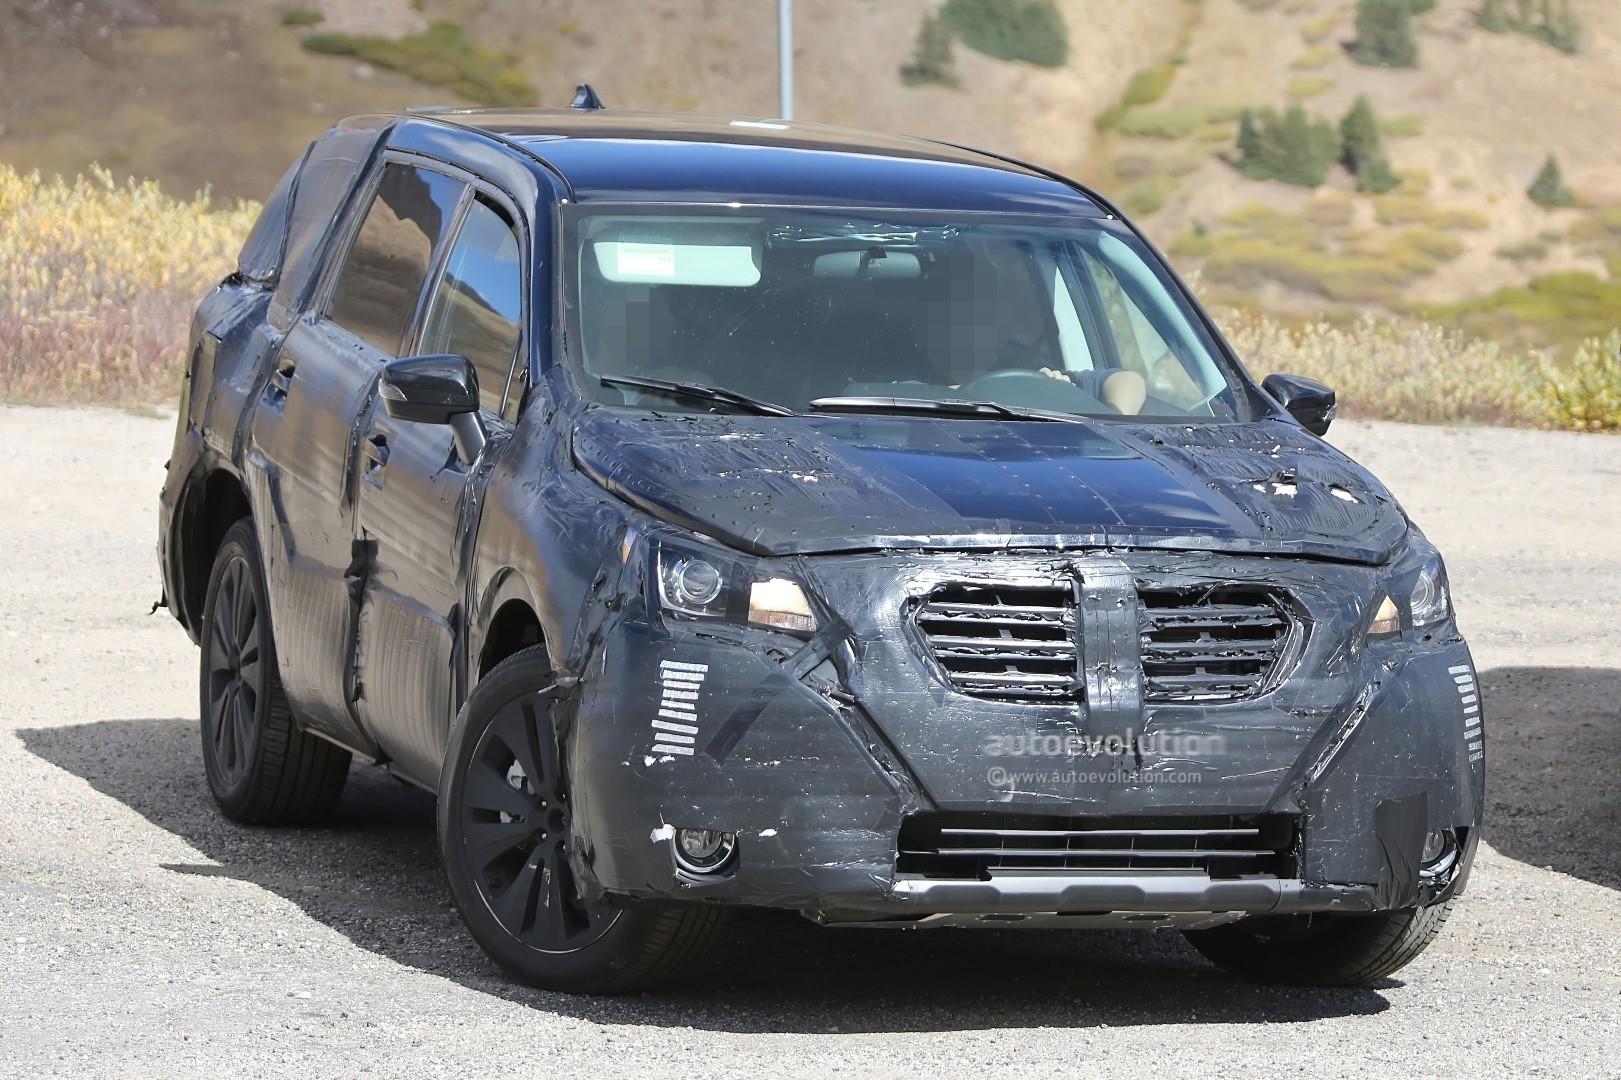 Cx 9 2017 >> 2019 Subaru Tribeca Heir Spied Benchmarking Against Mazda CX-9, Ford Explorer - autoevolution